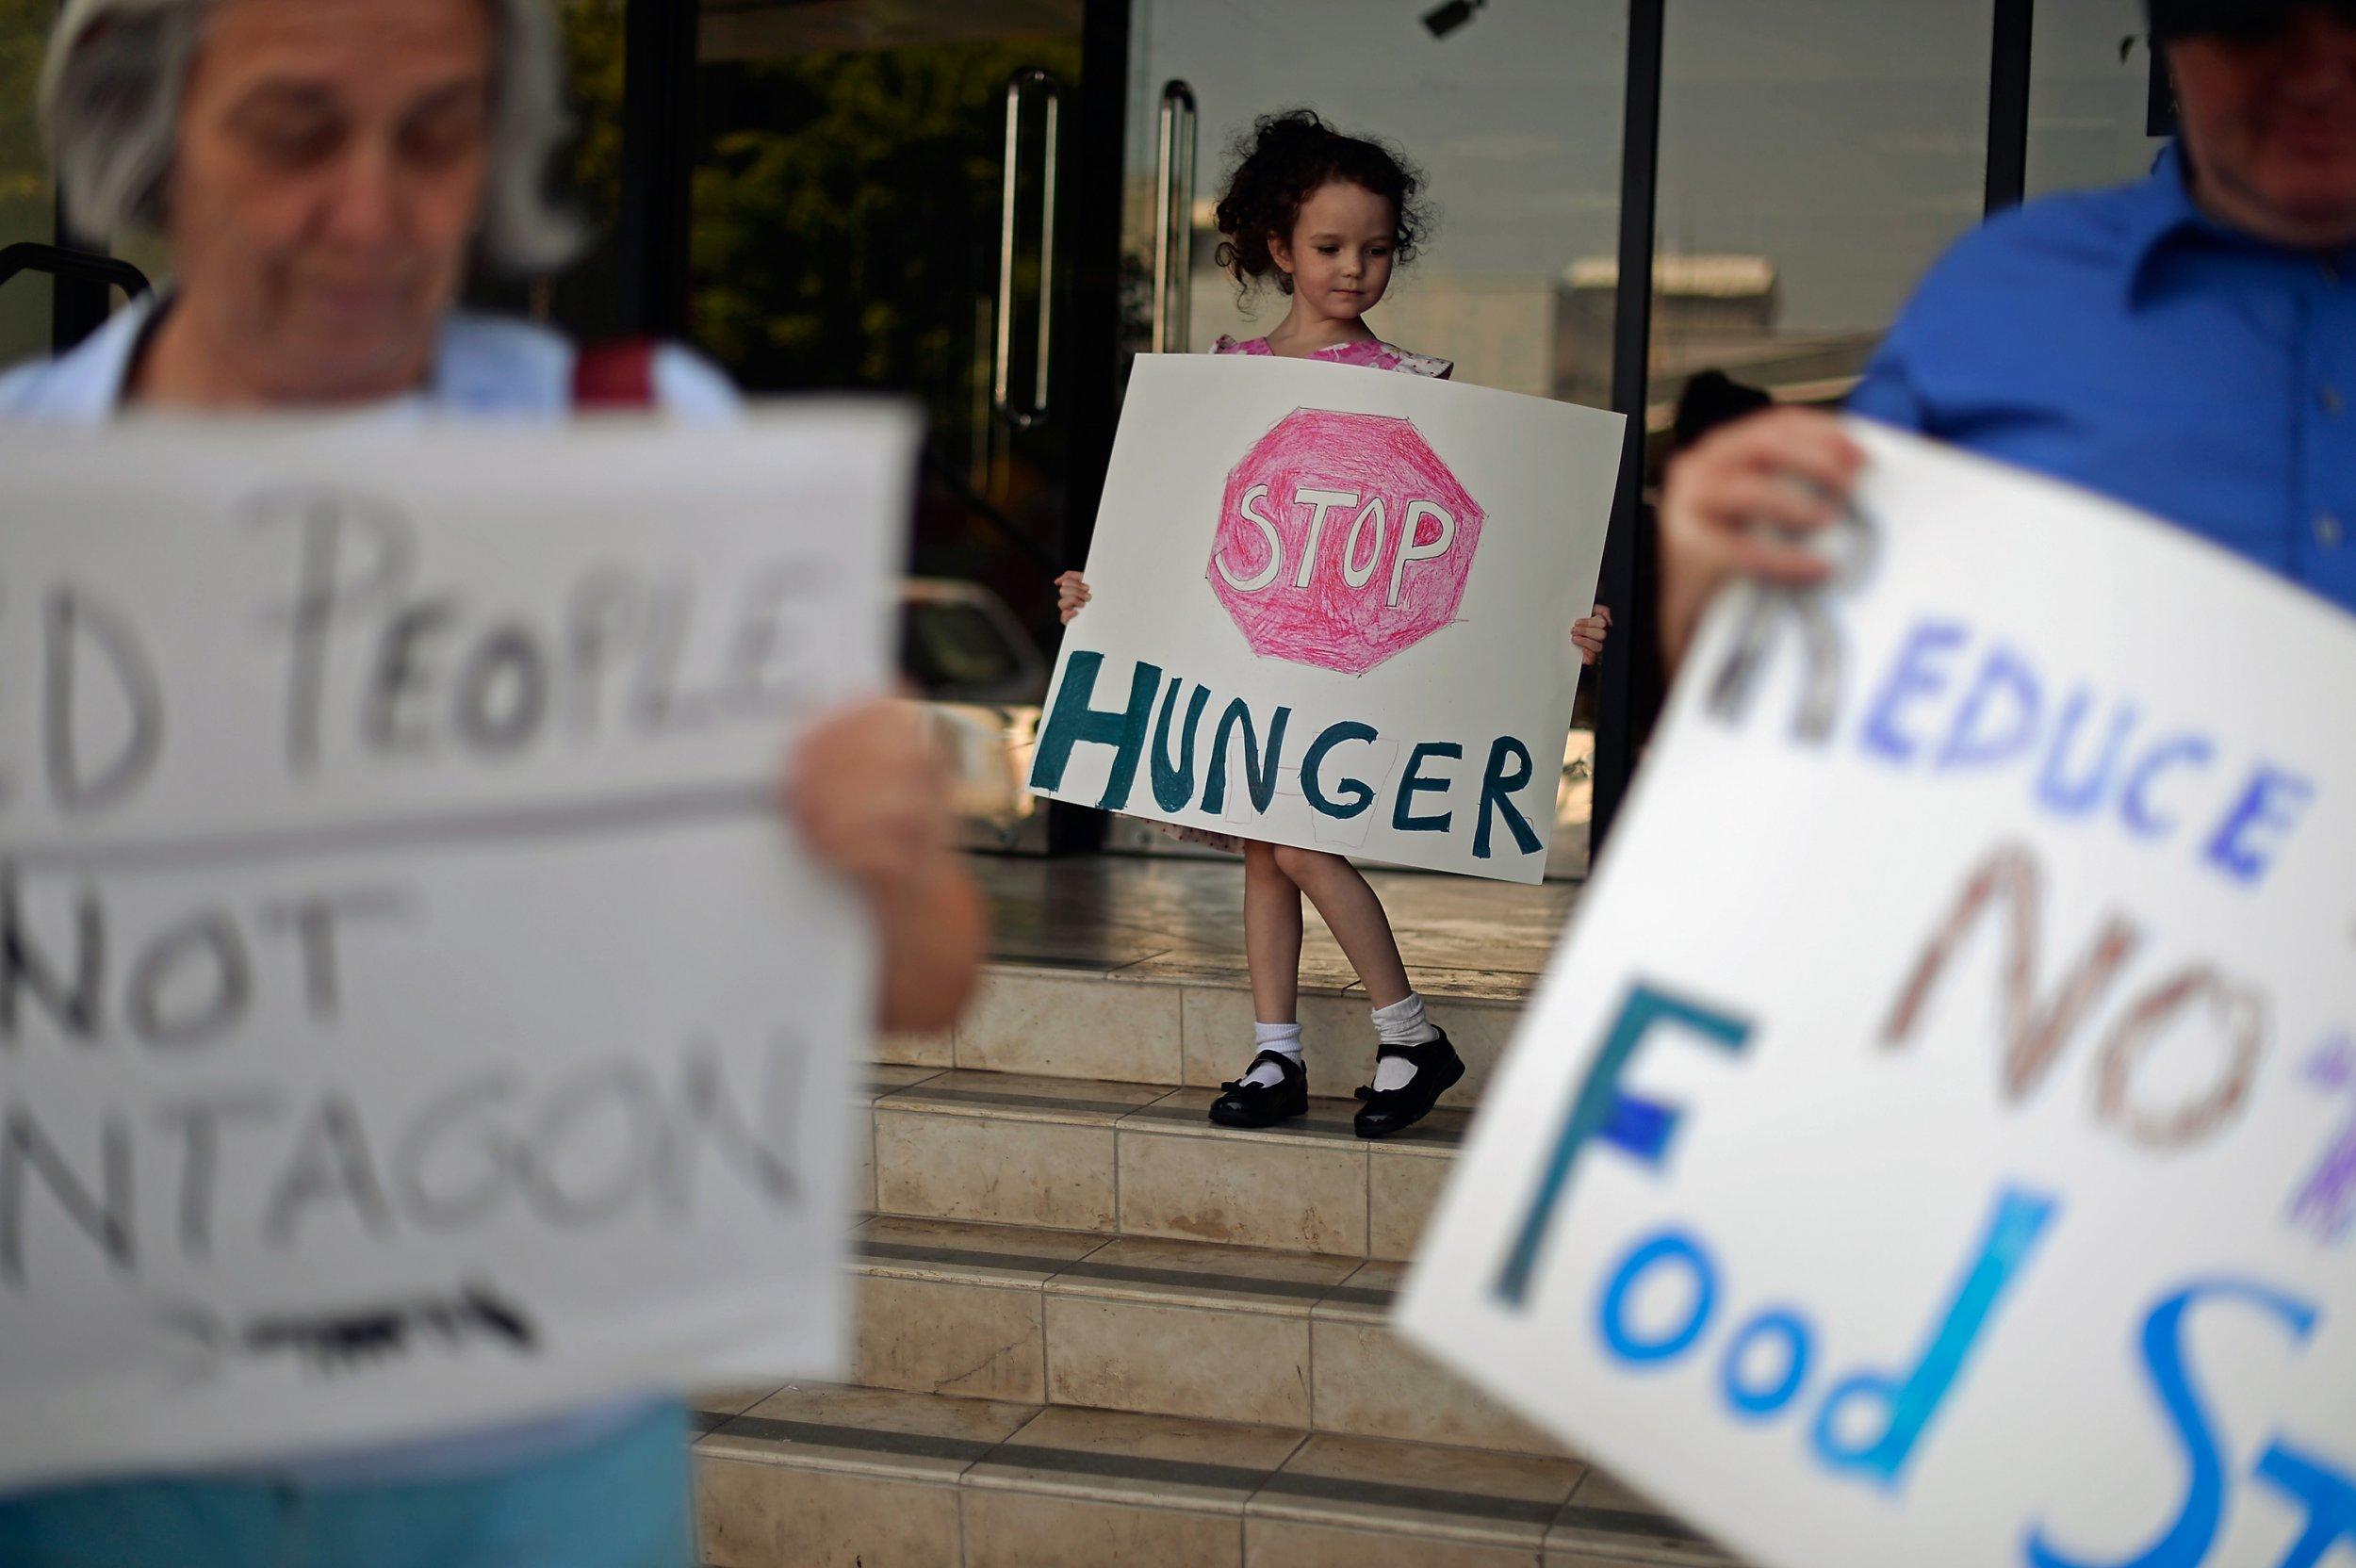 07 22 Food Stamps Decline The Number Of Supplemental Nutritional Assistance Program